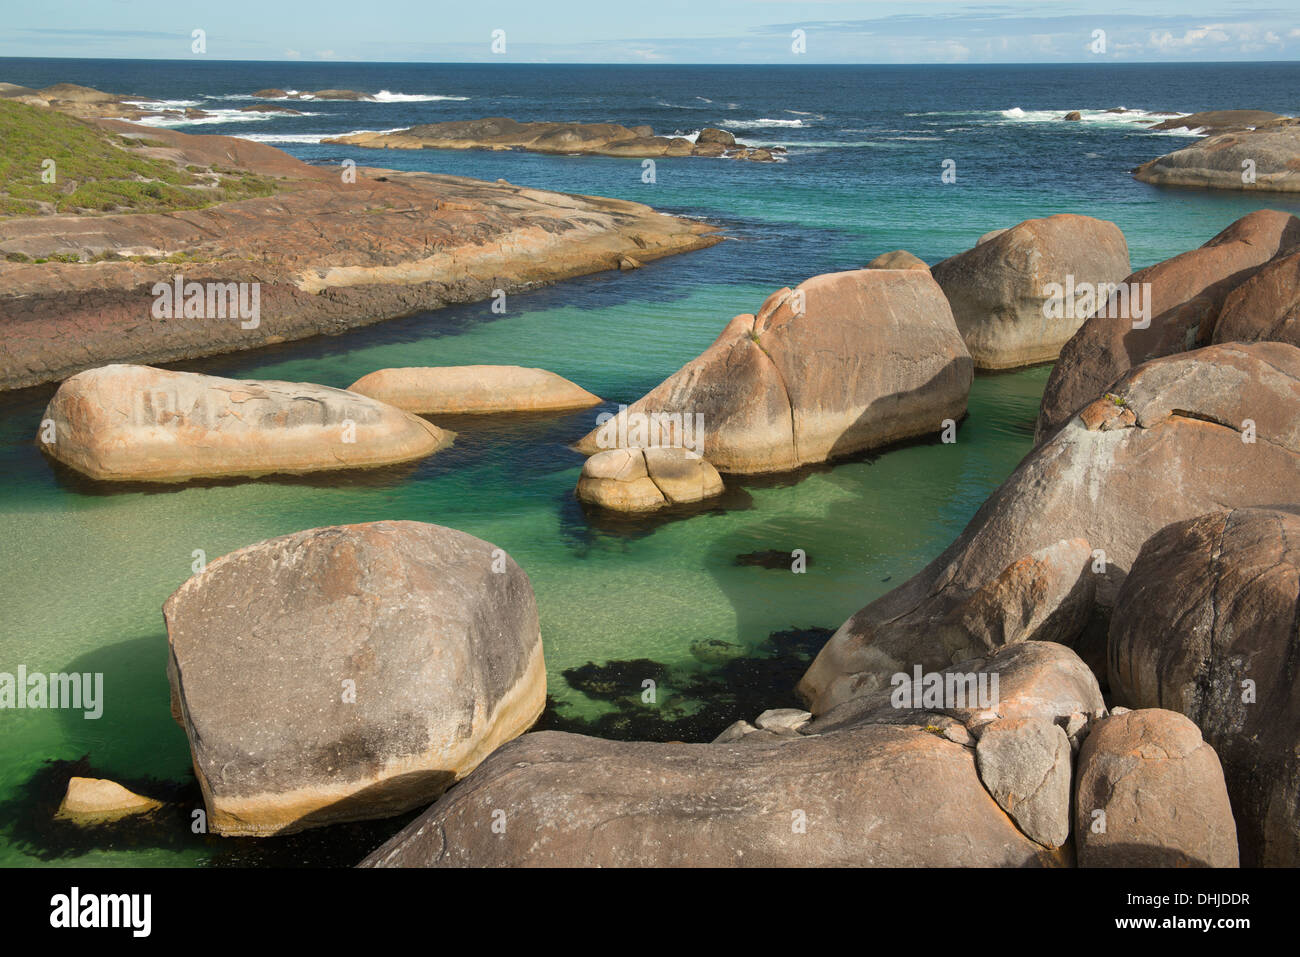 Elephant Rocks, William Bay National Park, Denmark, Western Australia - Stock Image